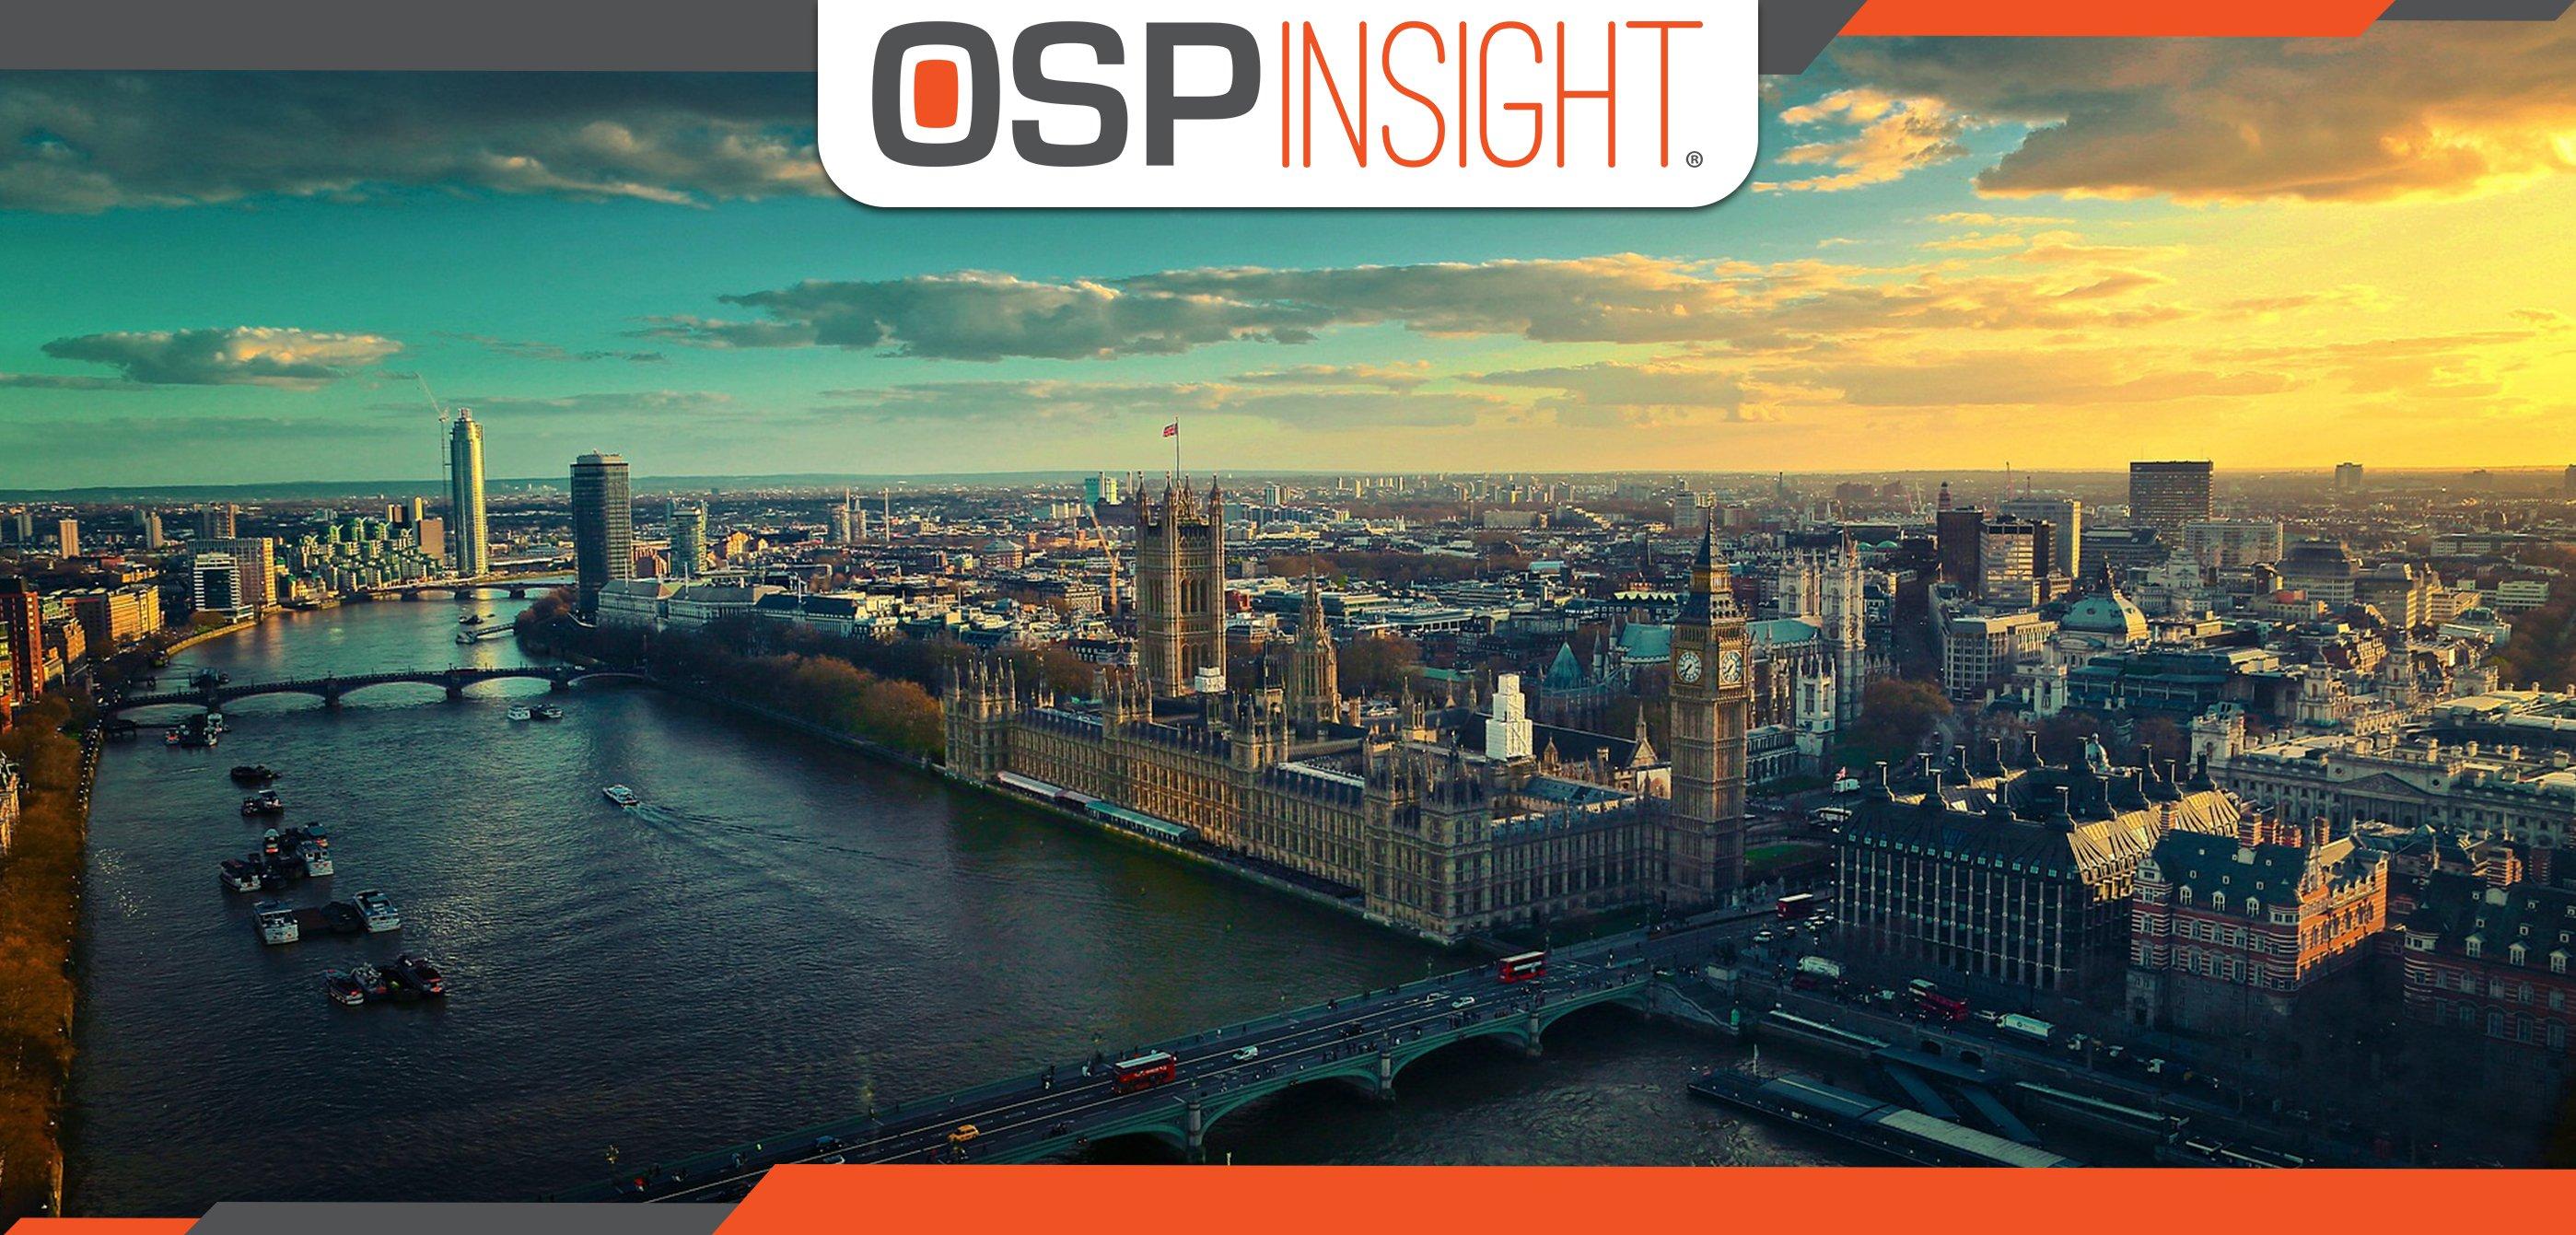 The UK Ramping Up Next-Gen Telecommunications (featured image)